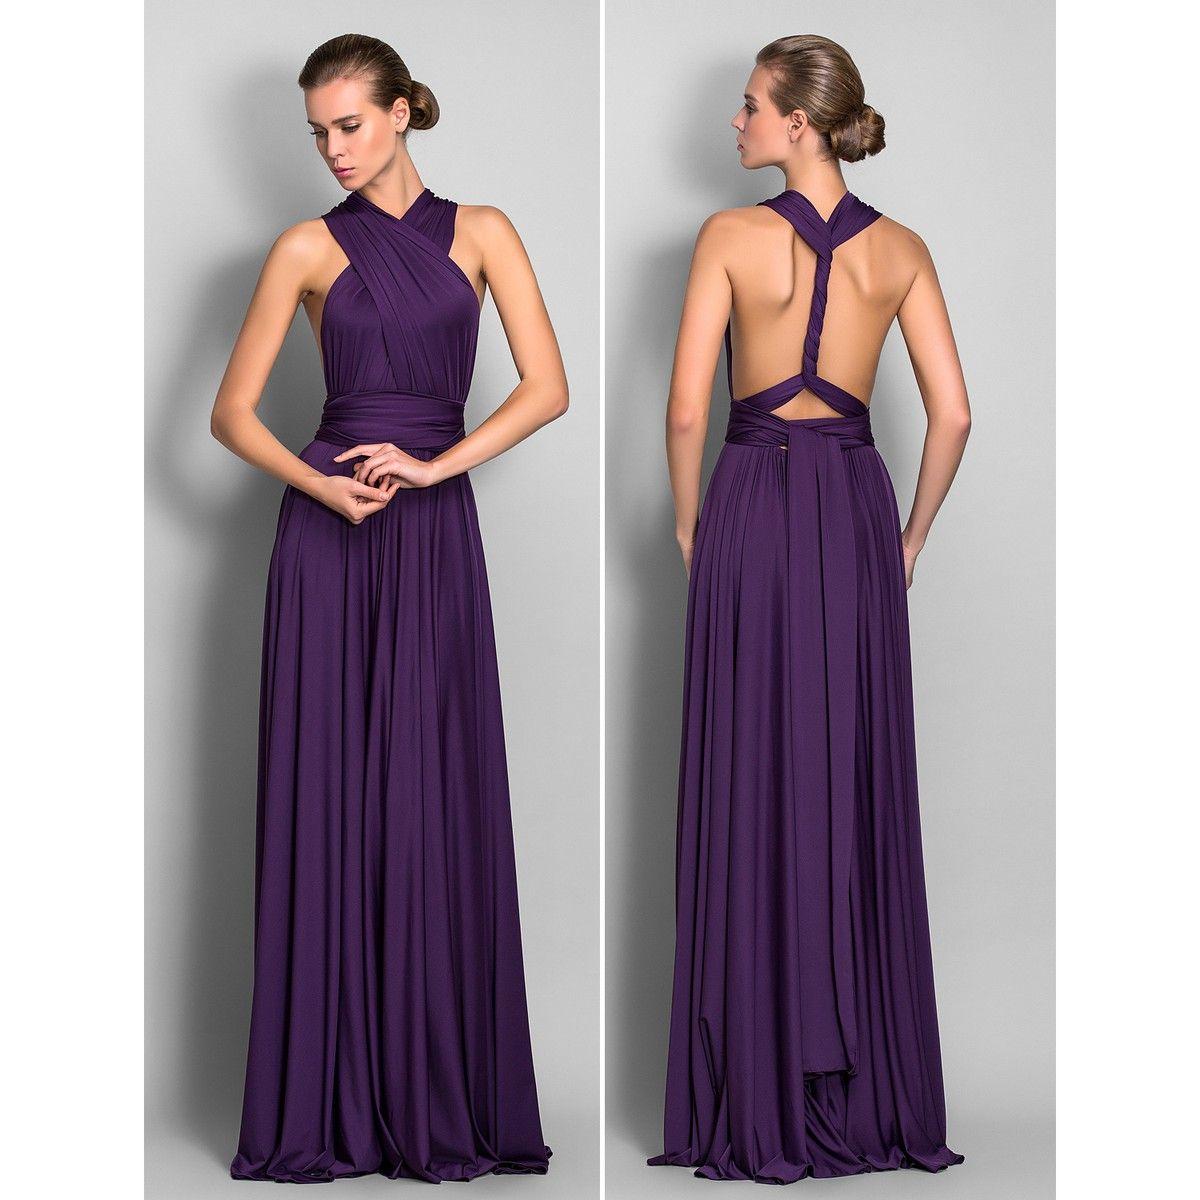 Blue camo wedding dresses  SheathColumn Floorlength Jersey Convertible Dress  things i love